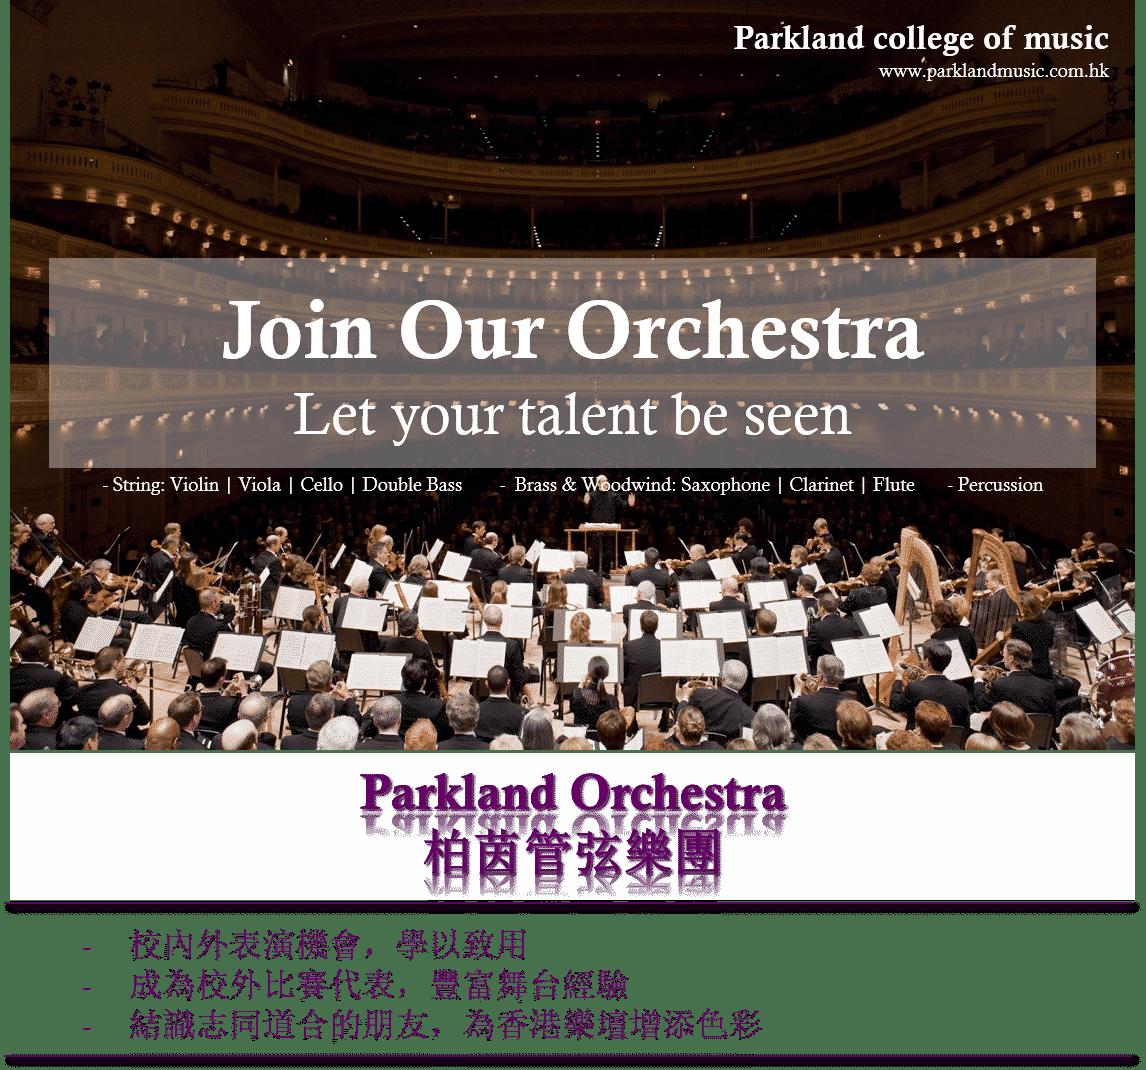 parkland_orchestra1